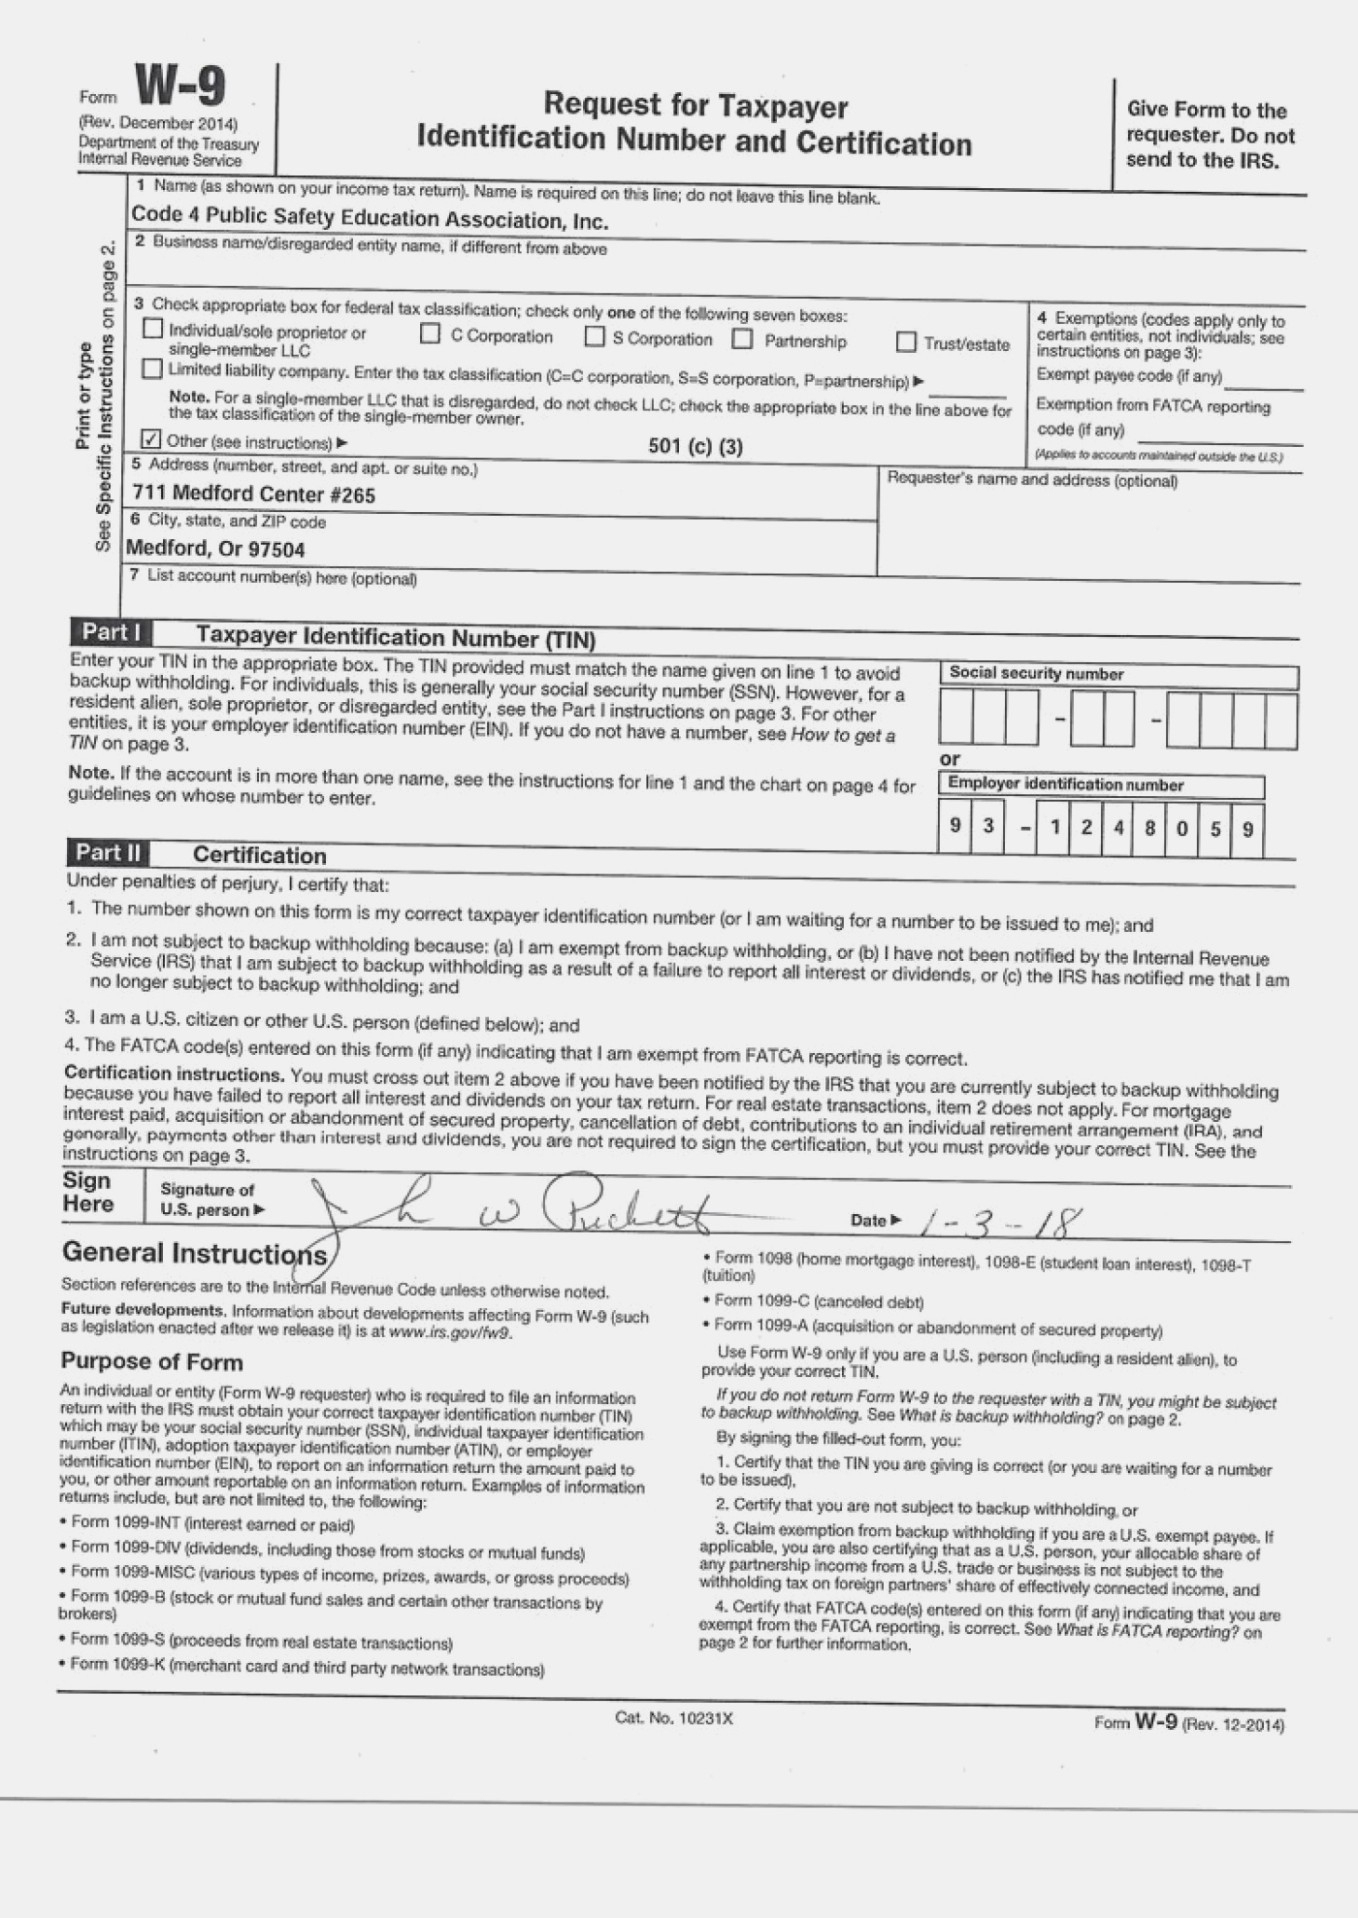 Irs W-9 Form 2021 Printable Pdf | Calendar Printable Free